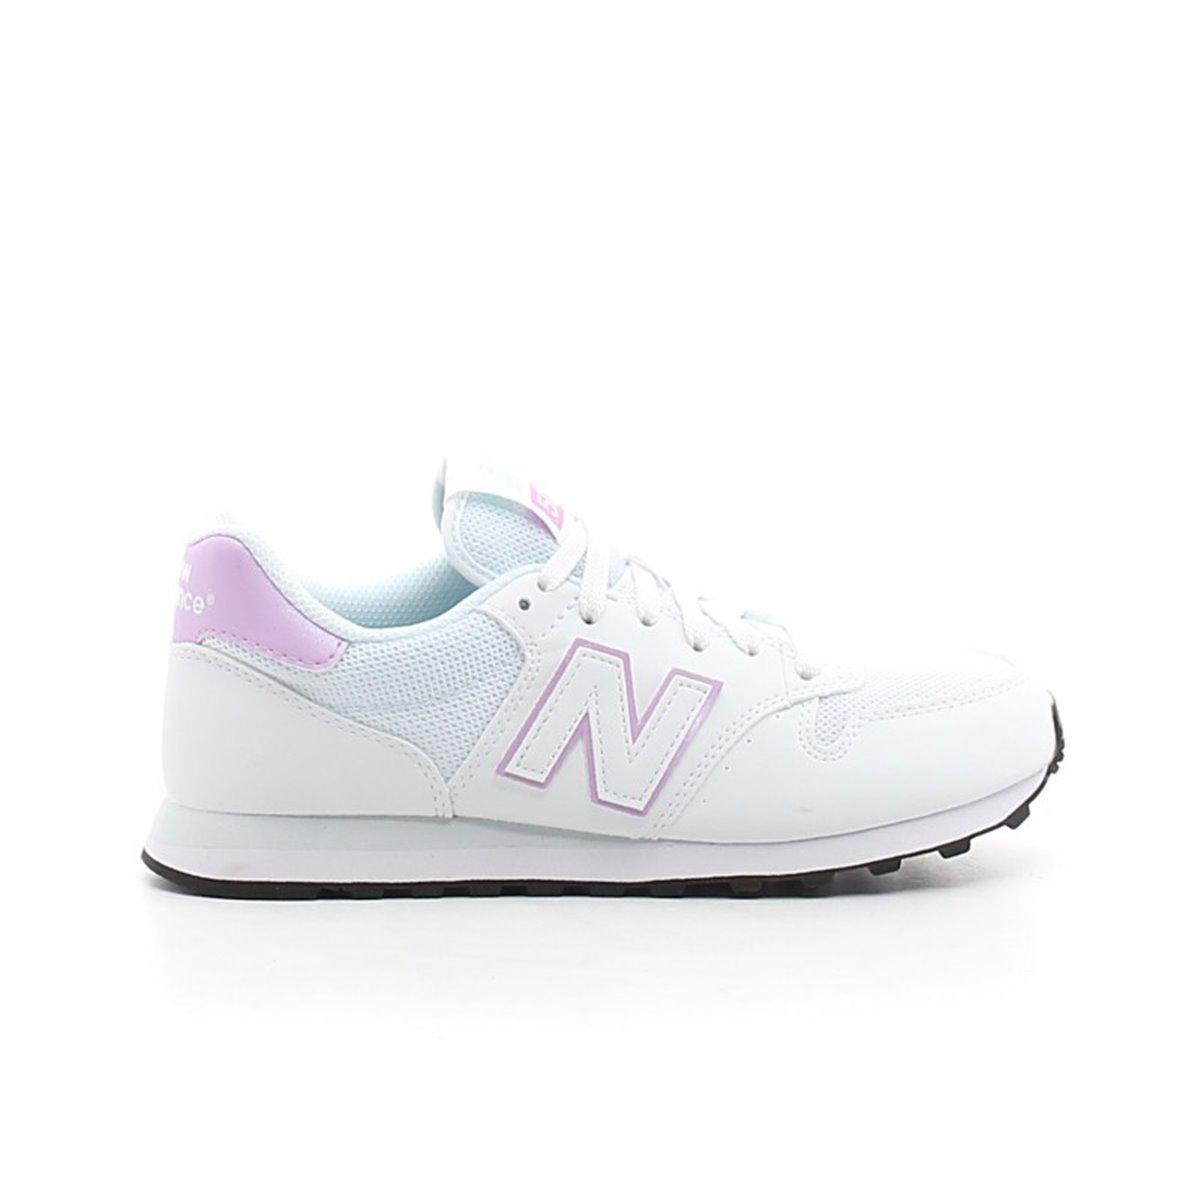 Scarpe New Balance 500 bianco rosa Bottero Ski